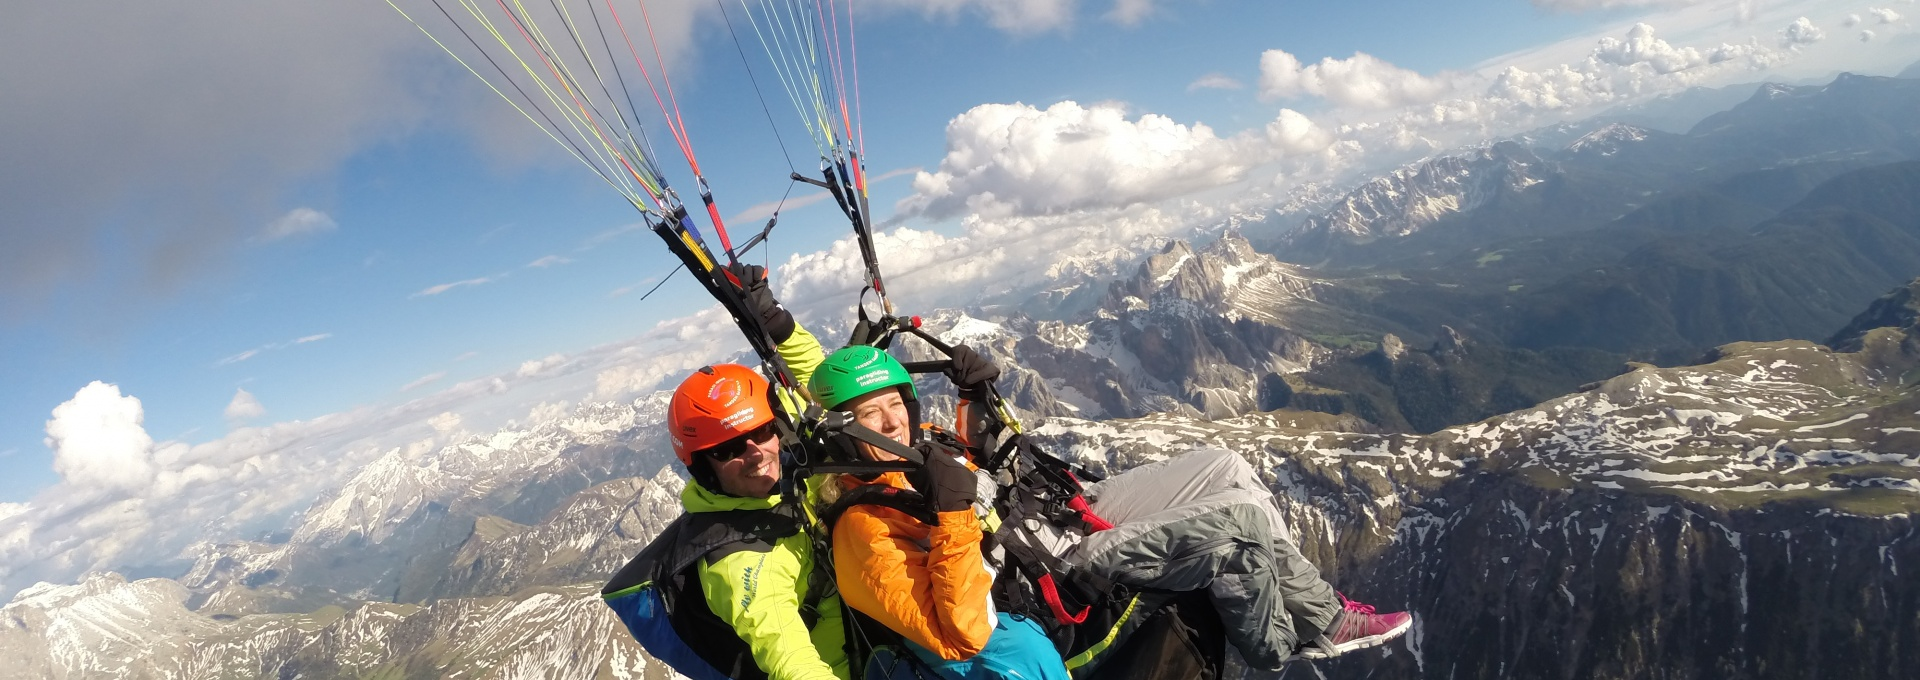 paragliding on Alpe di Siusi